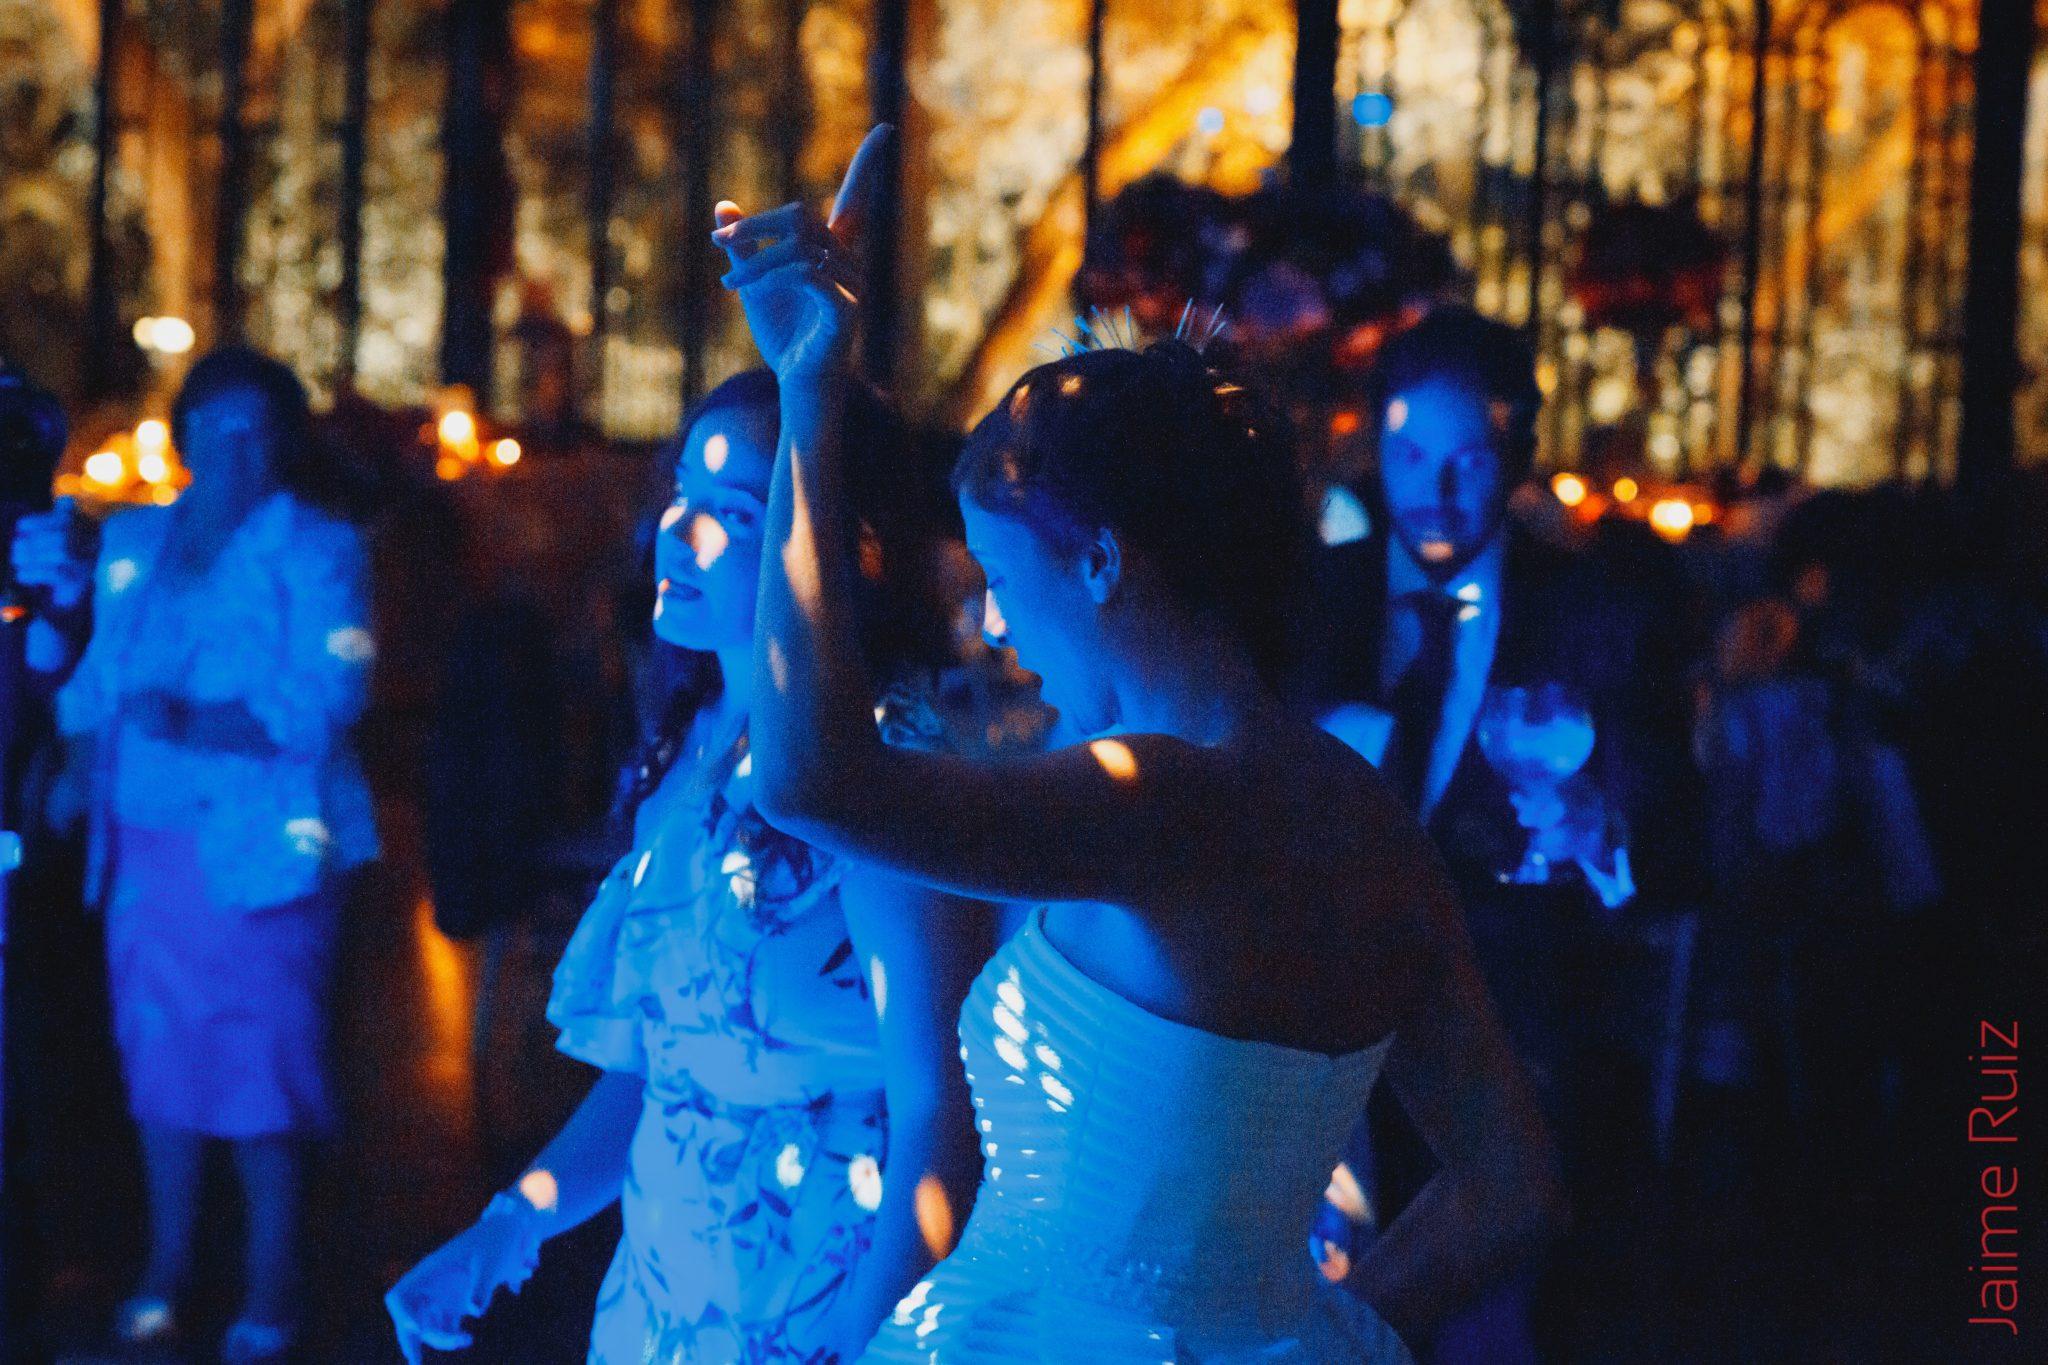 Bell Recó, fotografo bodas barcelona | fotografo de bodas en barcelona | fotografo de bodas barcelona | fotografia bodas barcelona | fotografo boda barcelona | fotograf casaments barcelona | fotografos bodas barcelona | contratar fotografos barcelona | contratar fotografos en barcelona | fotógrafos bodas barcelona | fotografia boda barcelona | fotografo bodas barato | fotografo barato barcelona | reportaje de bodas barcelona | fotografía de bodas barcelona girona | fotografos de bodas barcelona | fotografos de boda en barcelona | fotografos barcelona bodas | fotógrafo bodas barcelona | fotografo bodas girona | fotografo bodas tarragona | fotografo bodas lleida | fotografos de bodas en barcelona | fotografo boda barato | fotógrafo para bodas en barcelona | fotografo bodas en barcelona | fotografo de boda barcelona | fotógrafo de bodas en barcelona